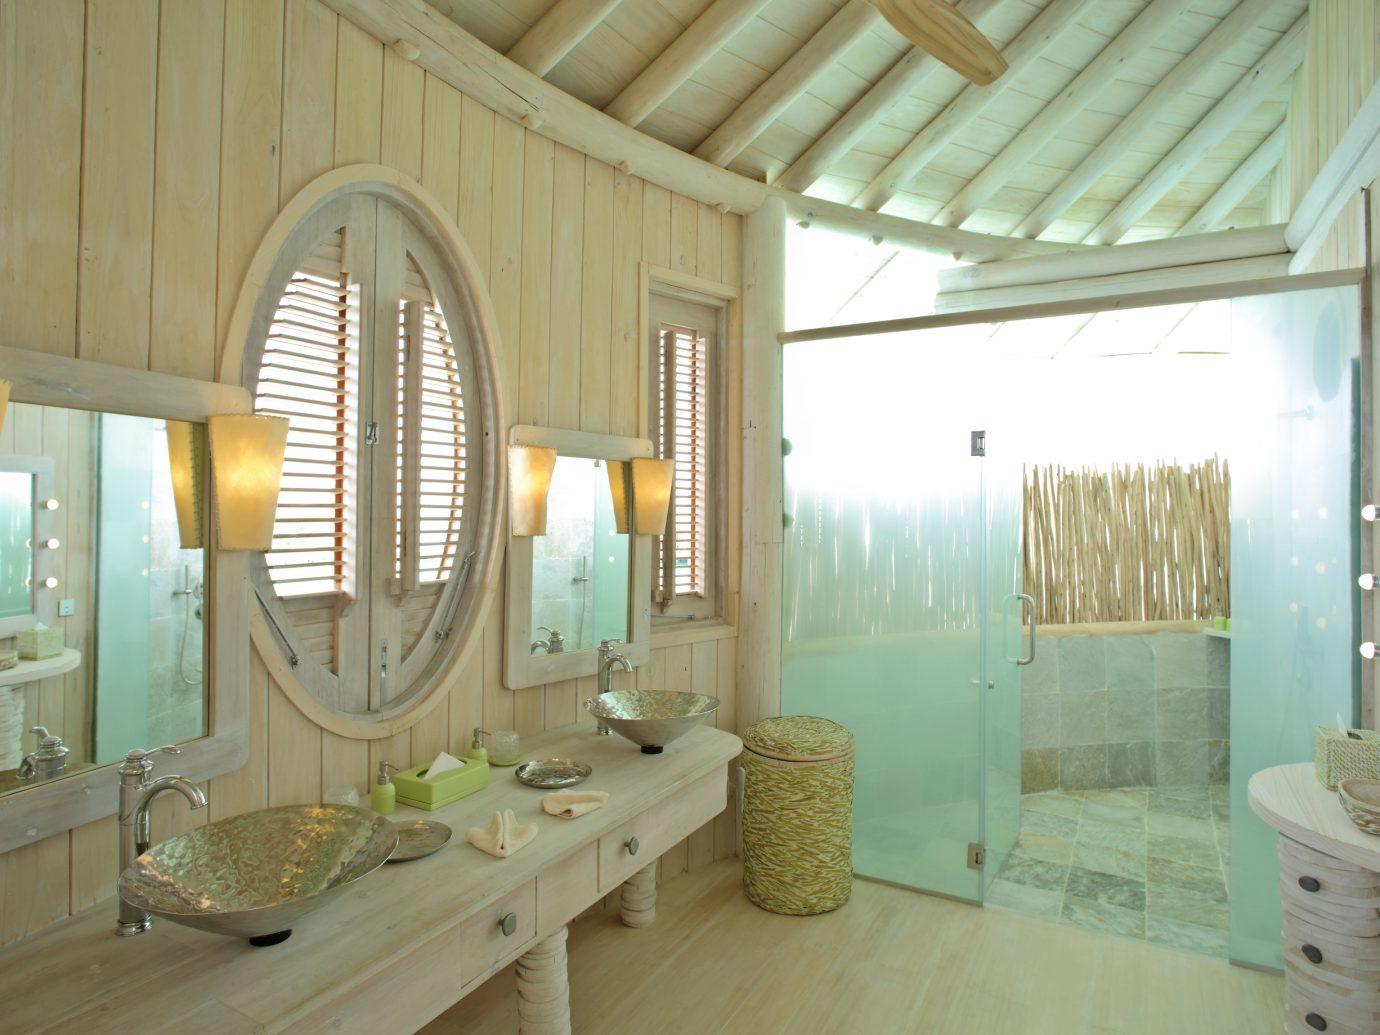 Bathroom at Soneva Jani Resort